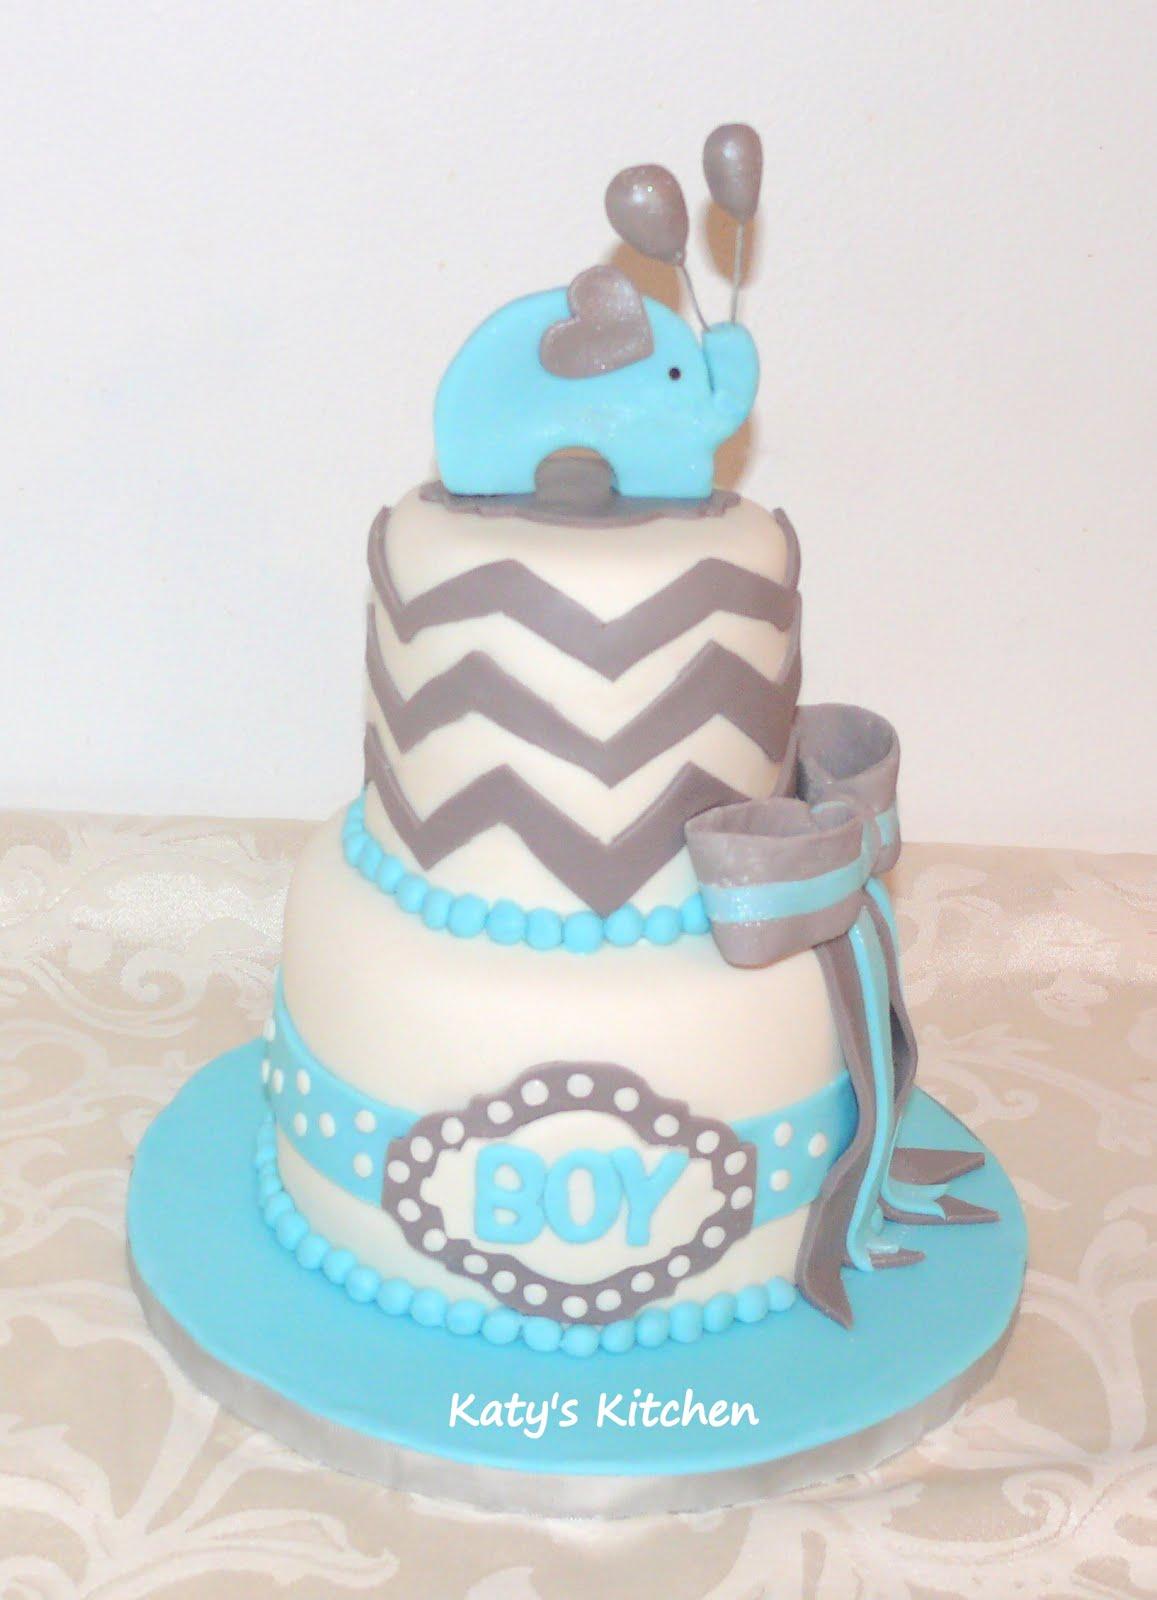 Baby Shower Cakes Utah ~ Katy s kitchen elephant baby shower cake